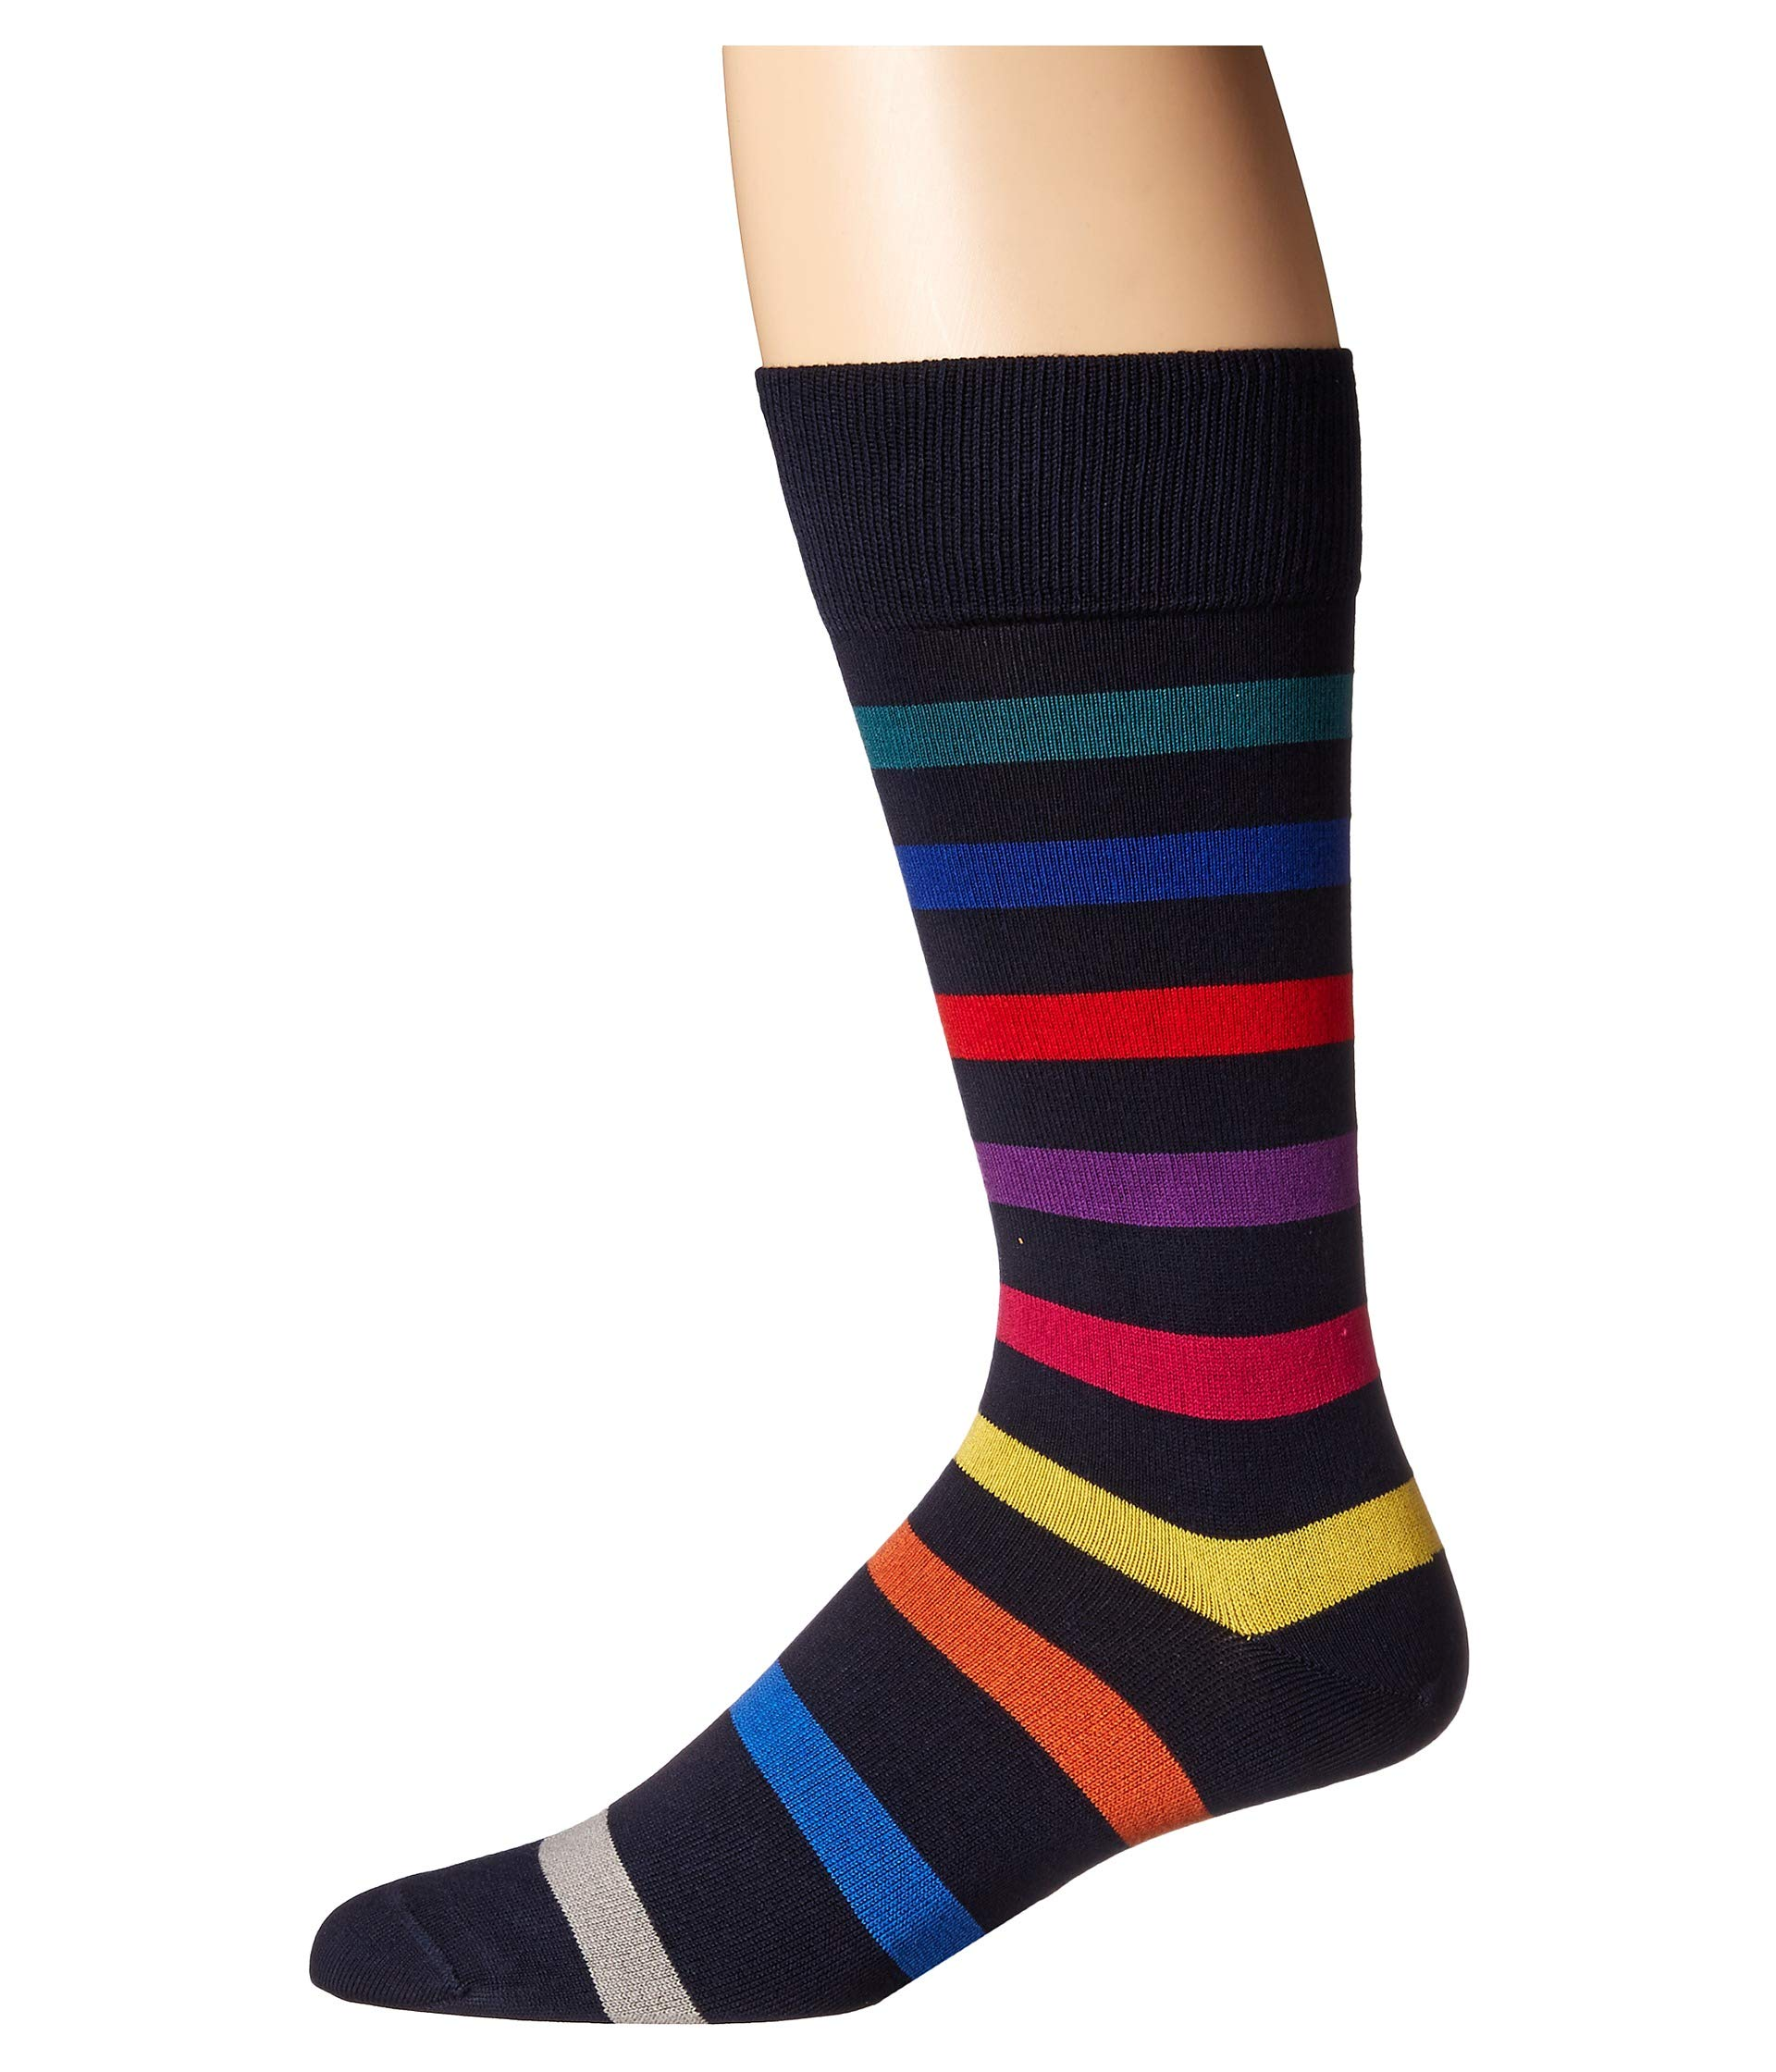 Sock Lock Navy Stripe Paul Smith xTPwqACR